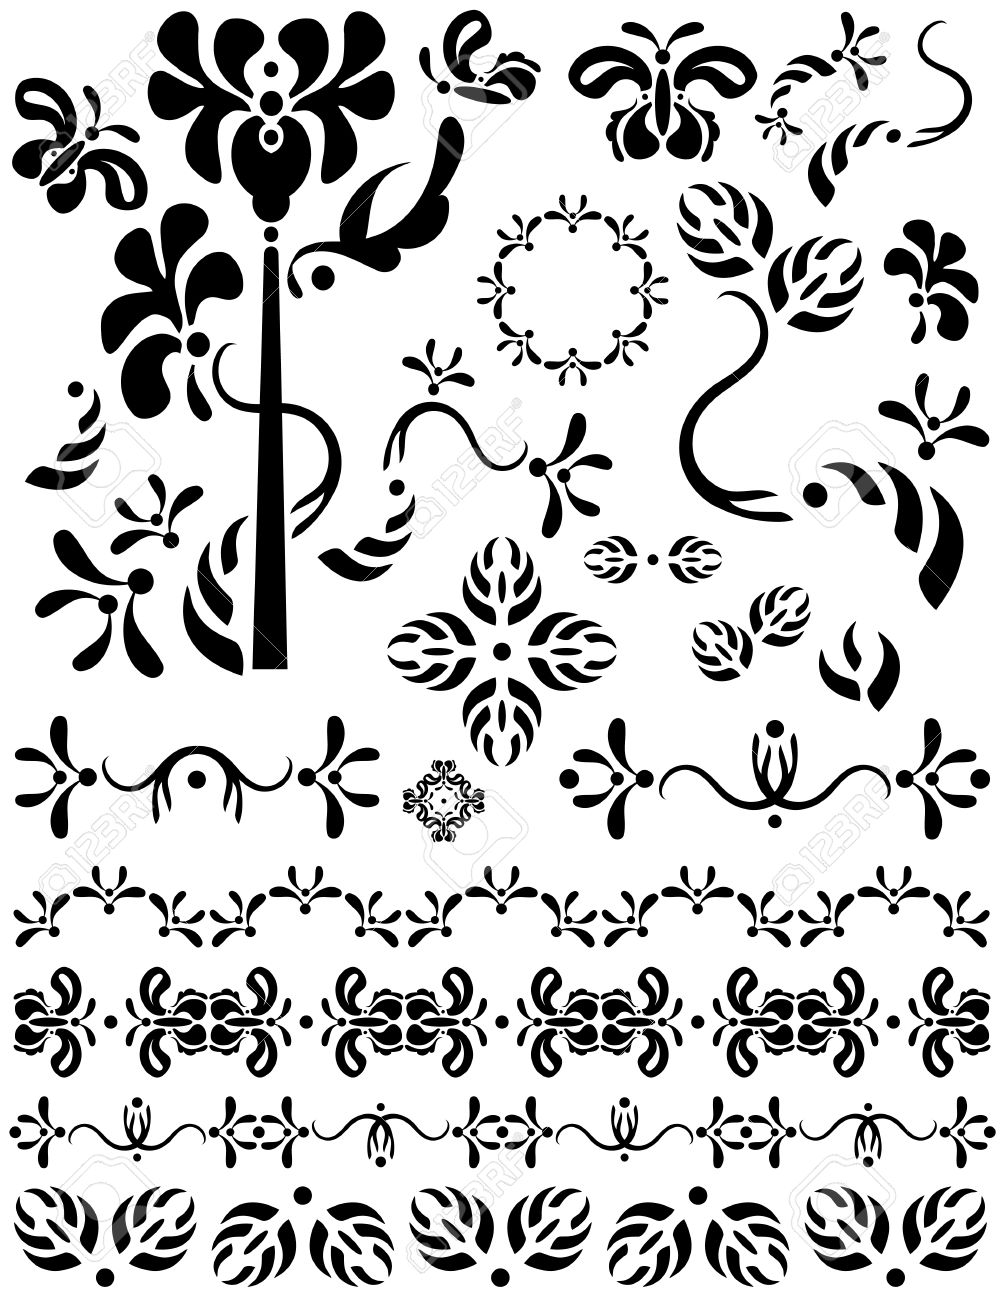 Divider on White Background on a White Background